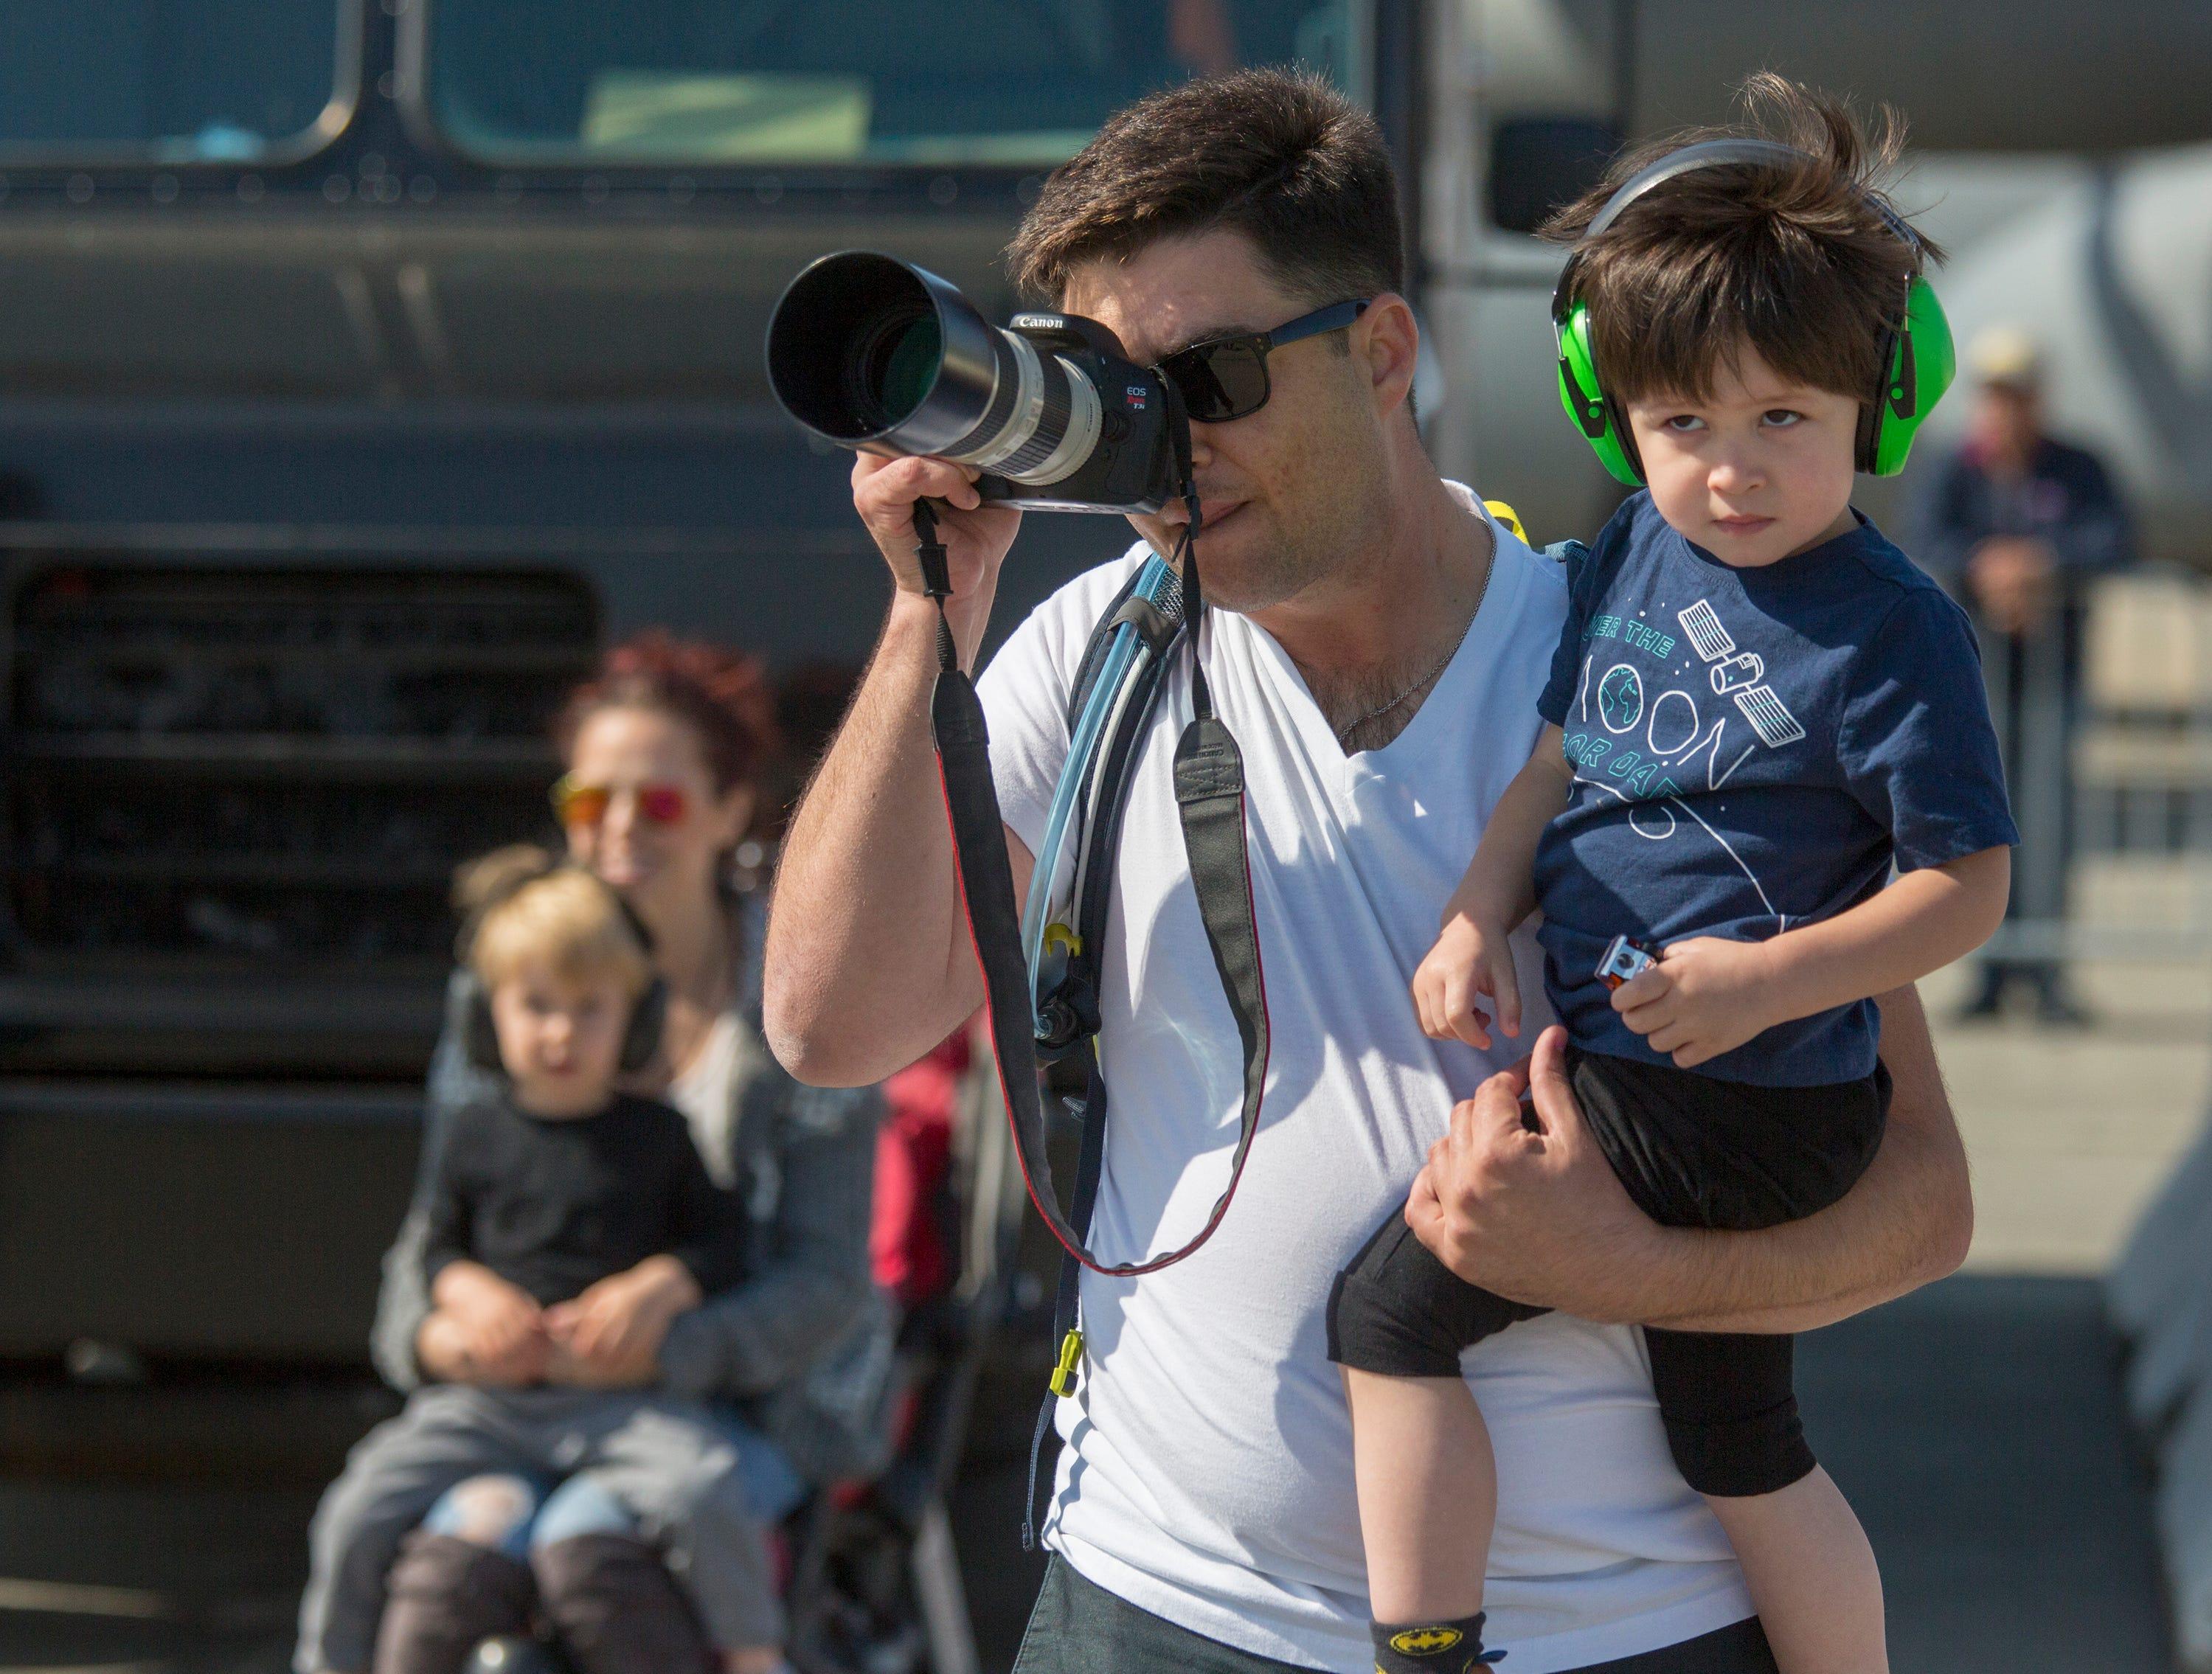 A man shoots photos while holding his son during the California International Airshow Salinas at the Salinas Airport on March 23, 2019. (Photo by David Royal)